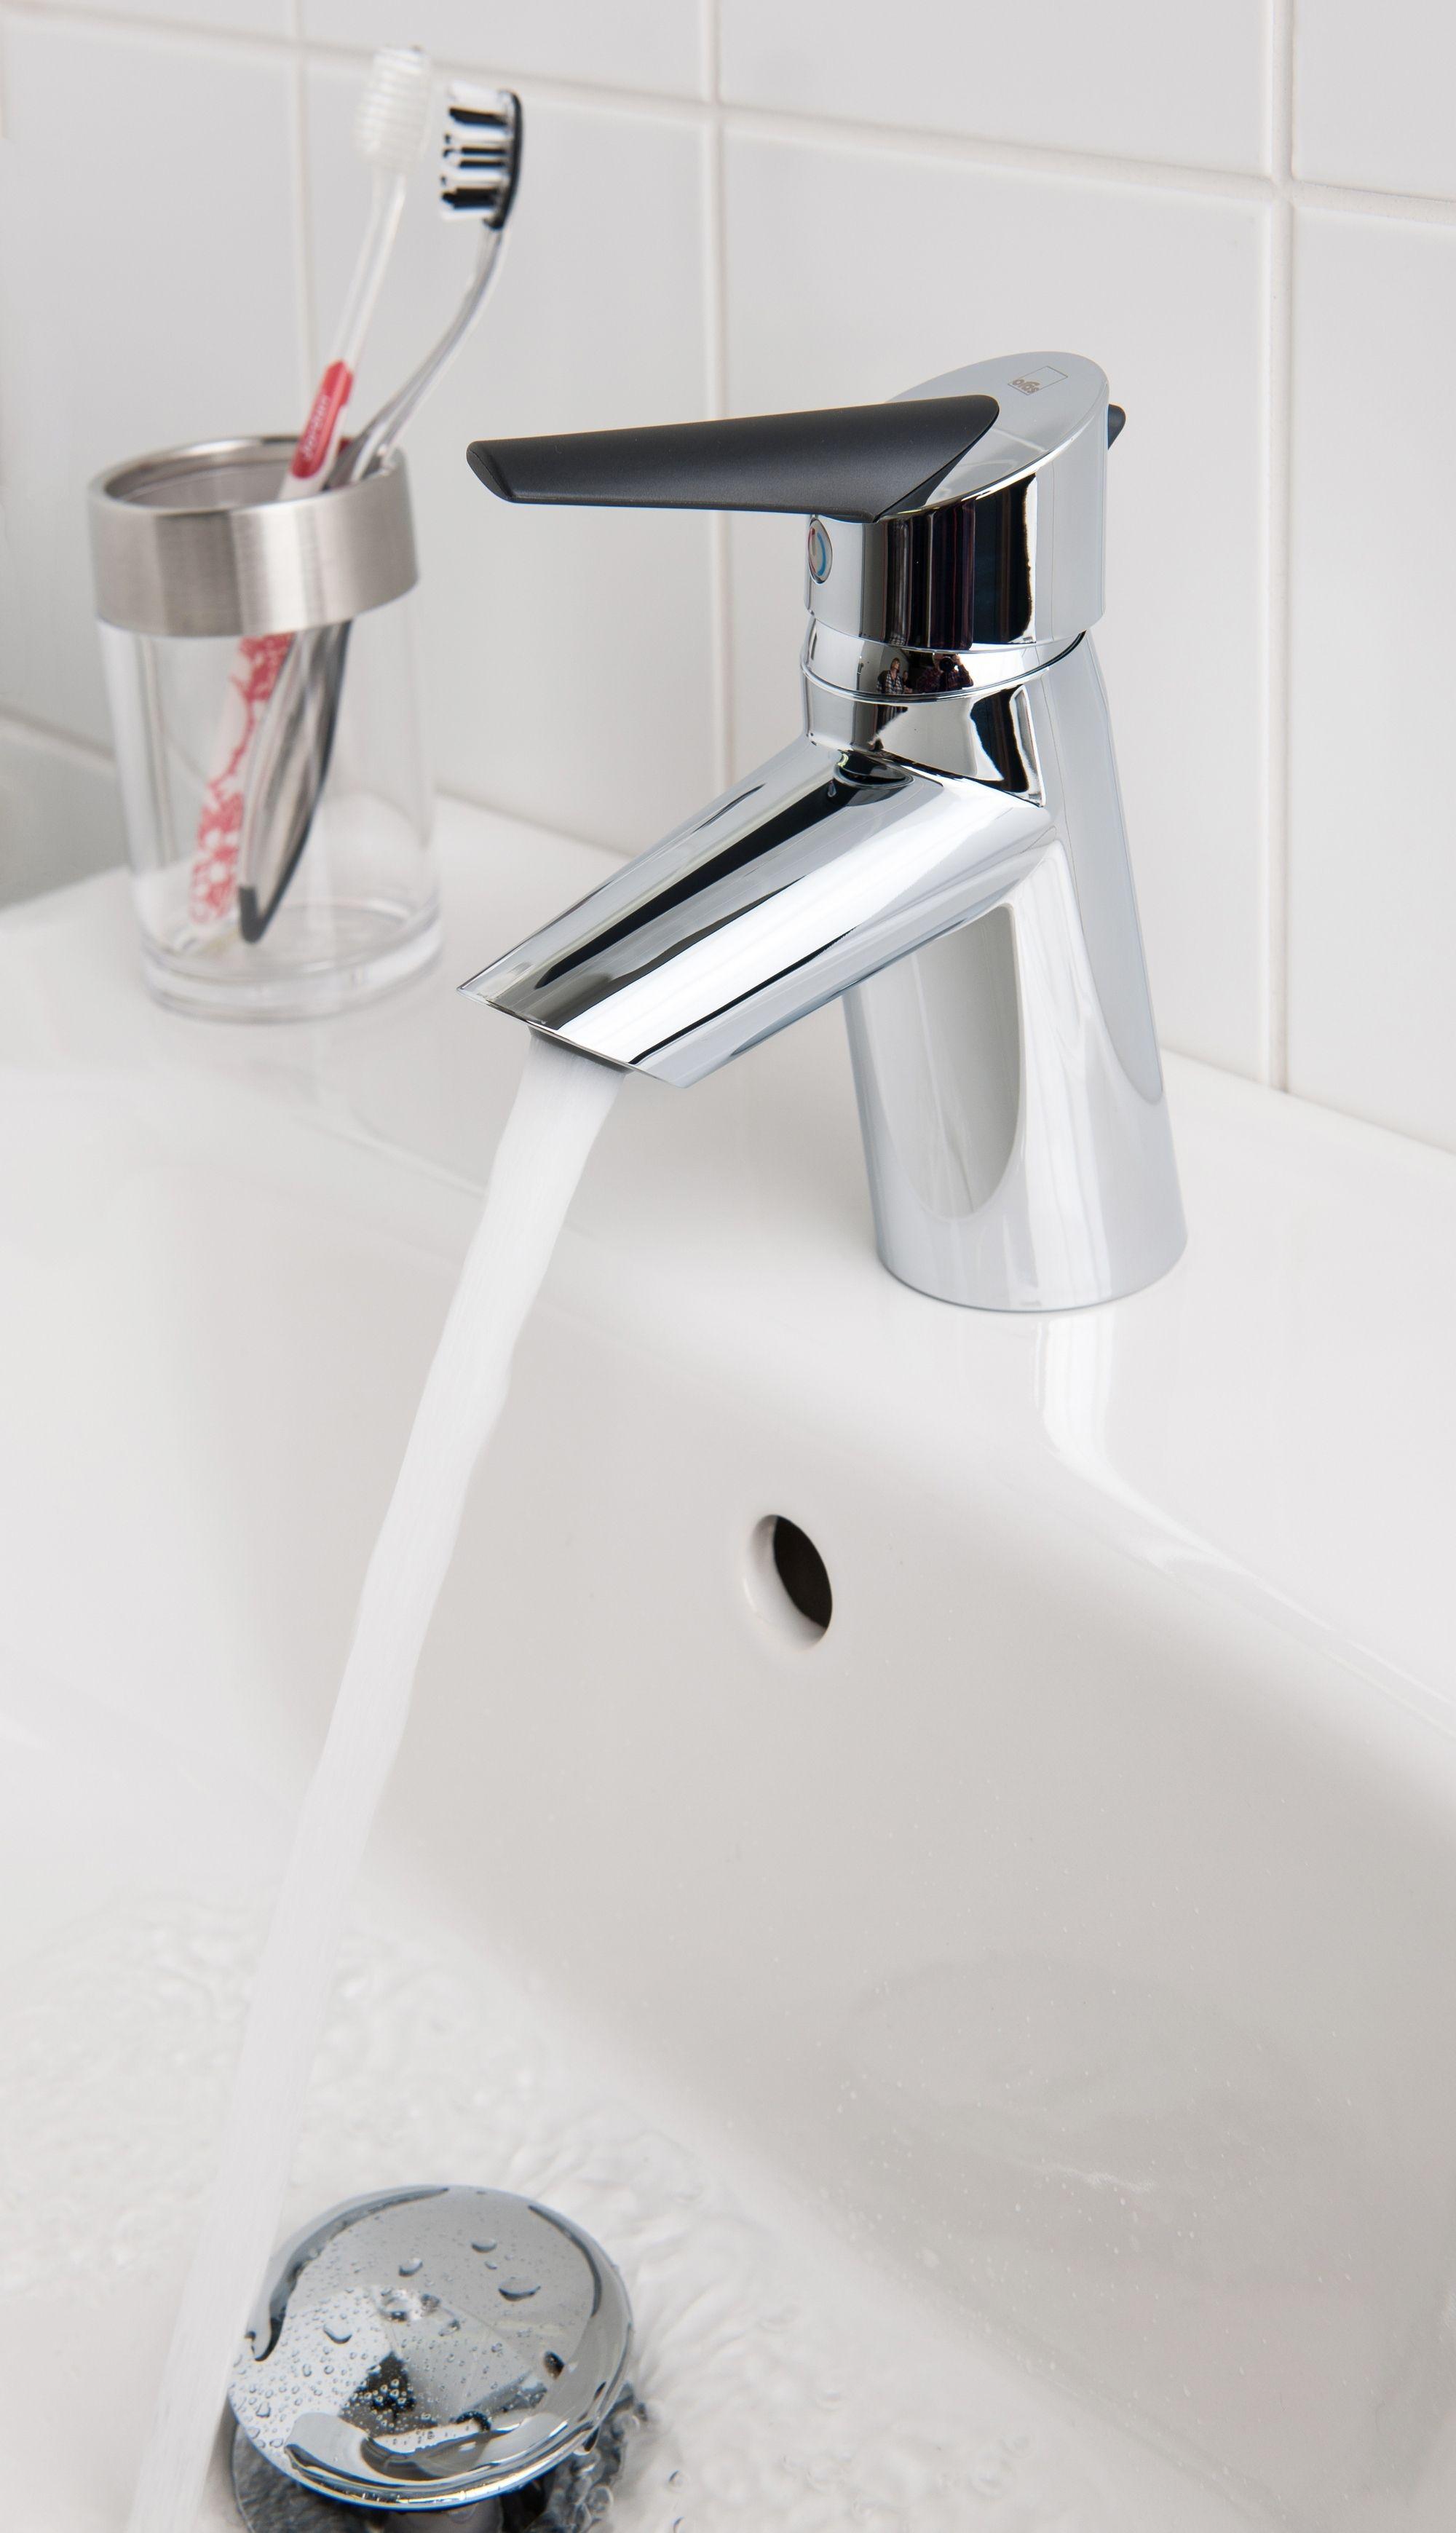 washbasin faucet Oras Optima 2700F | Oras Optima | Pinterest | Faucet